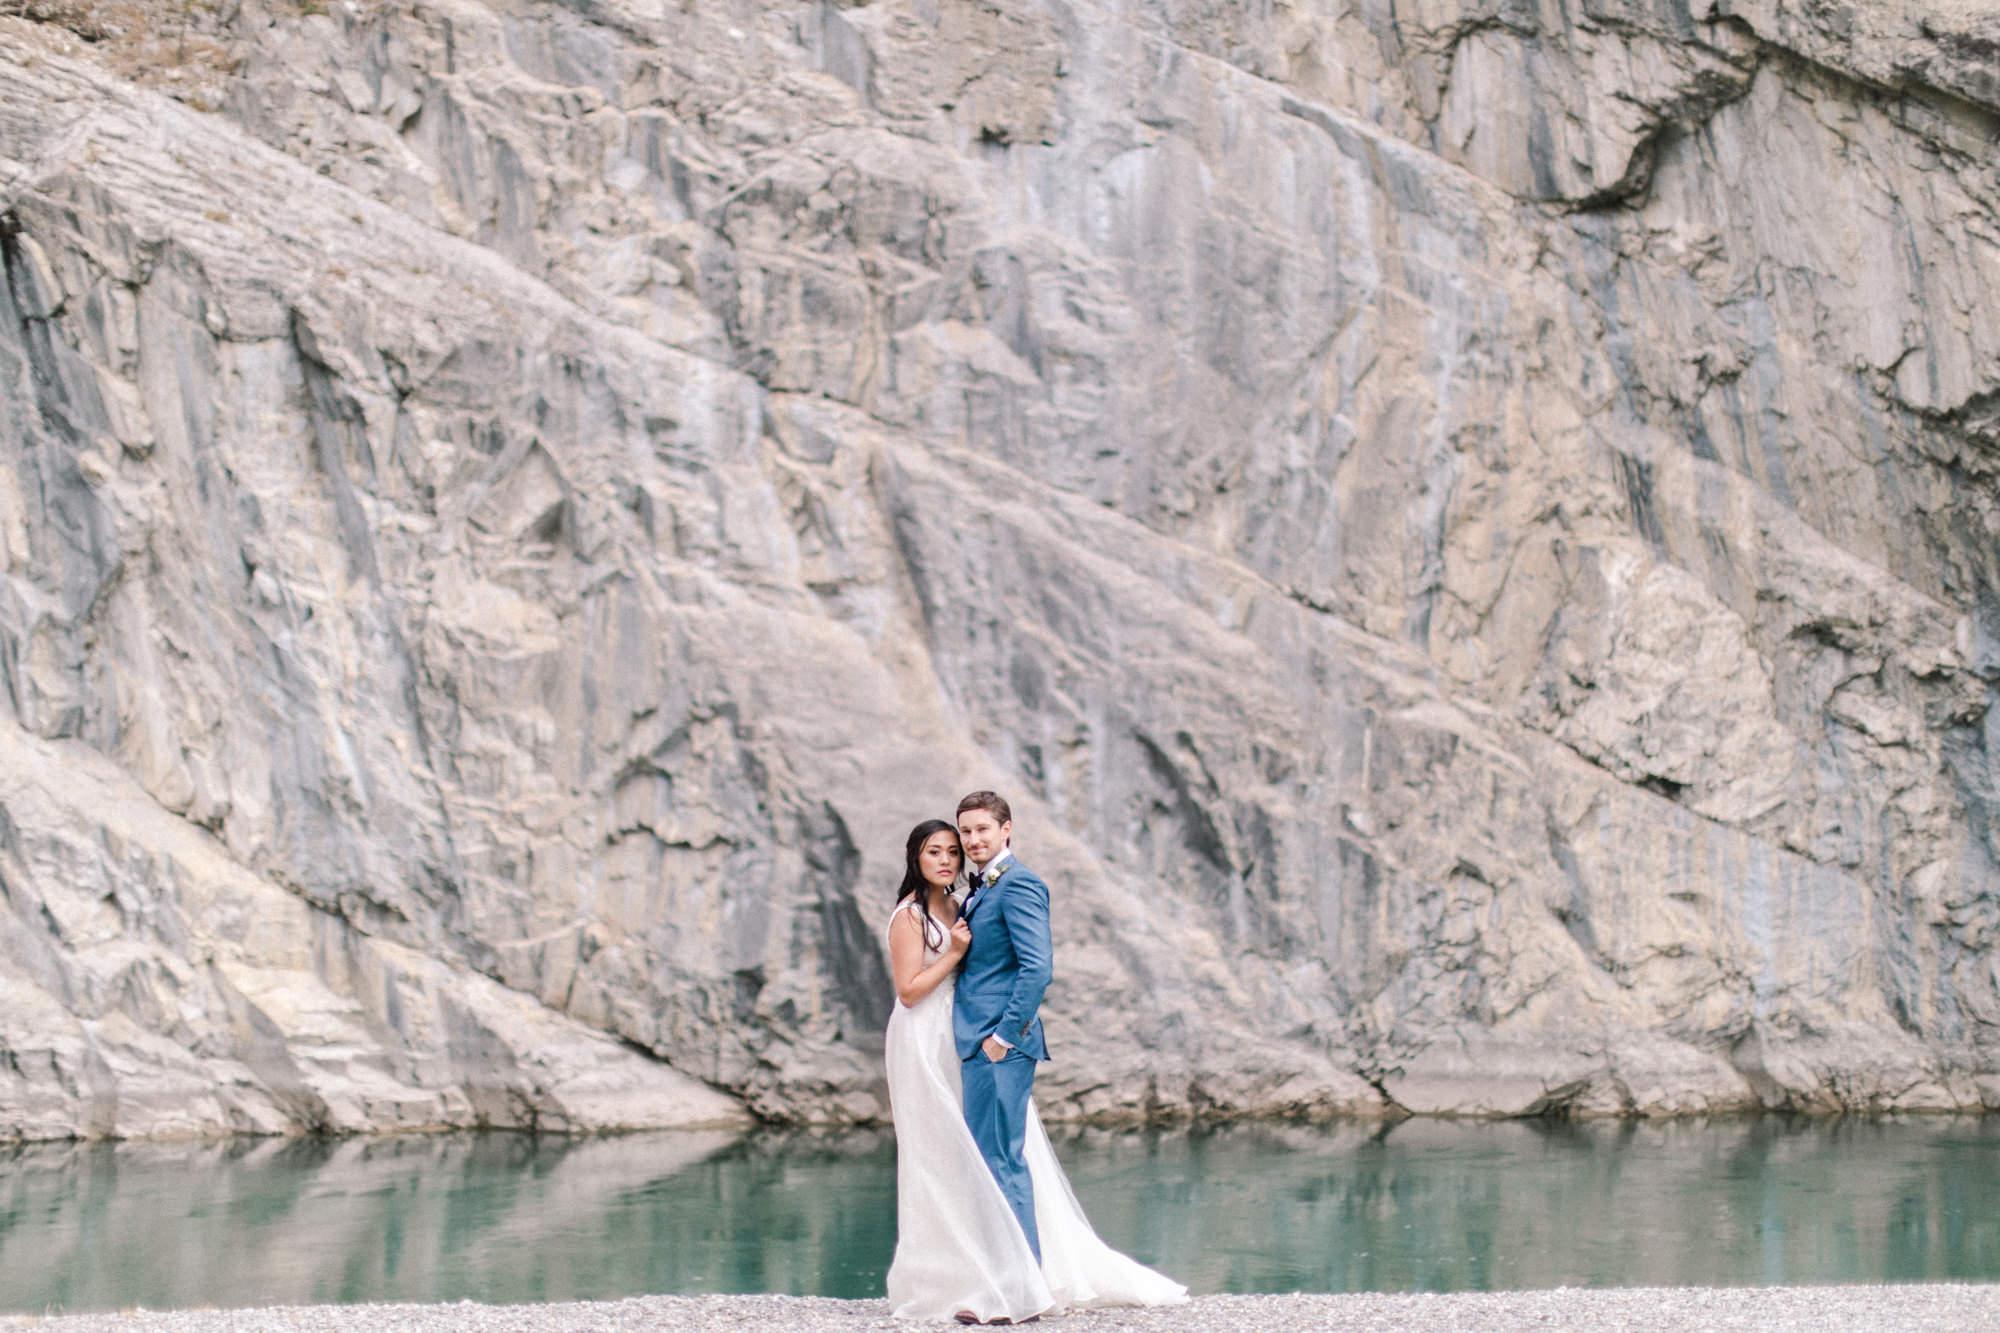 Invermere-boho-lake-wedding-1-3.jpg